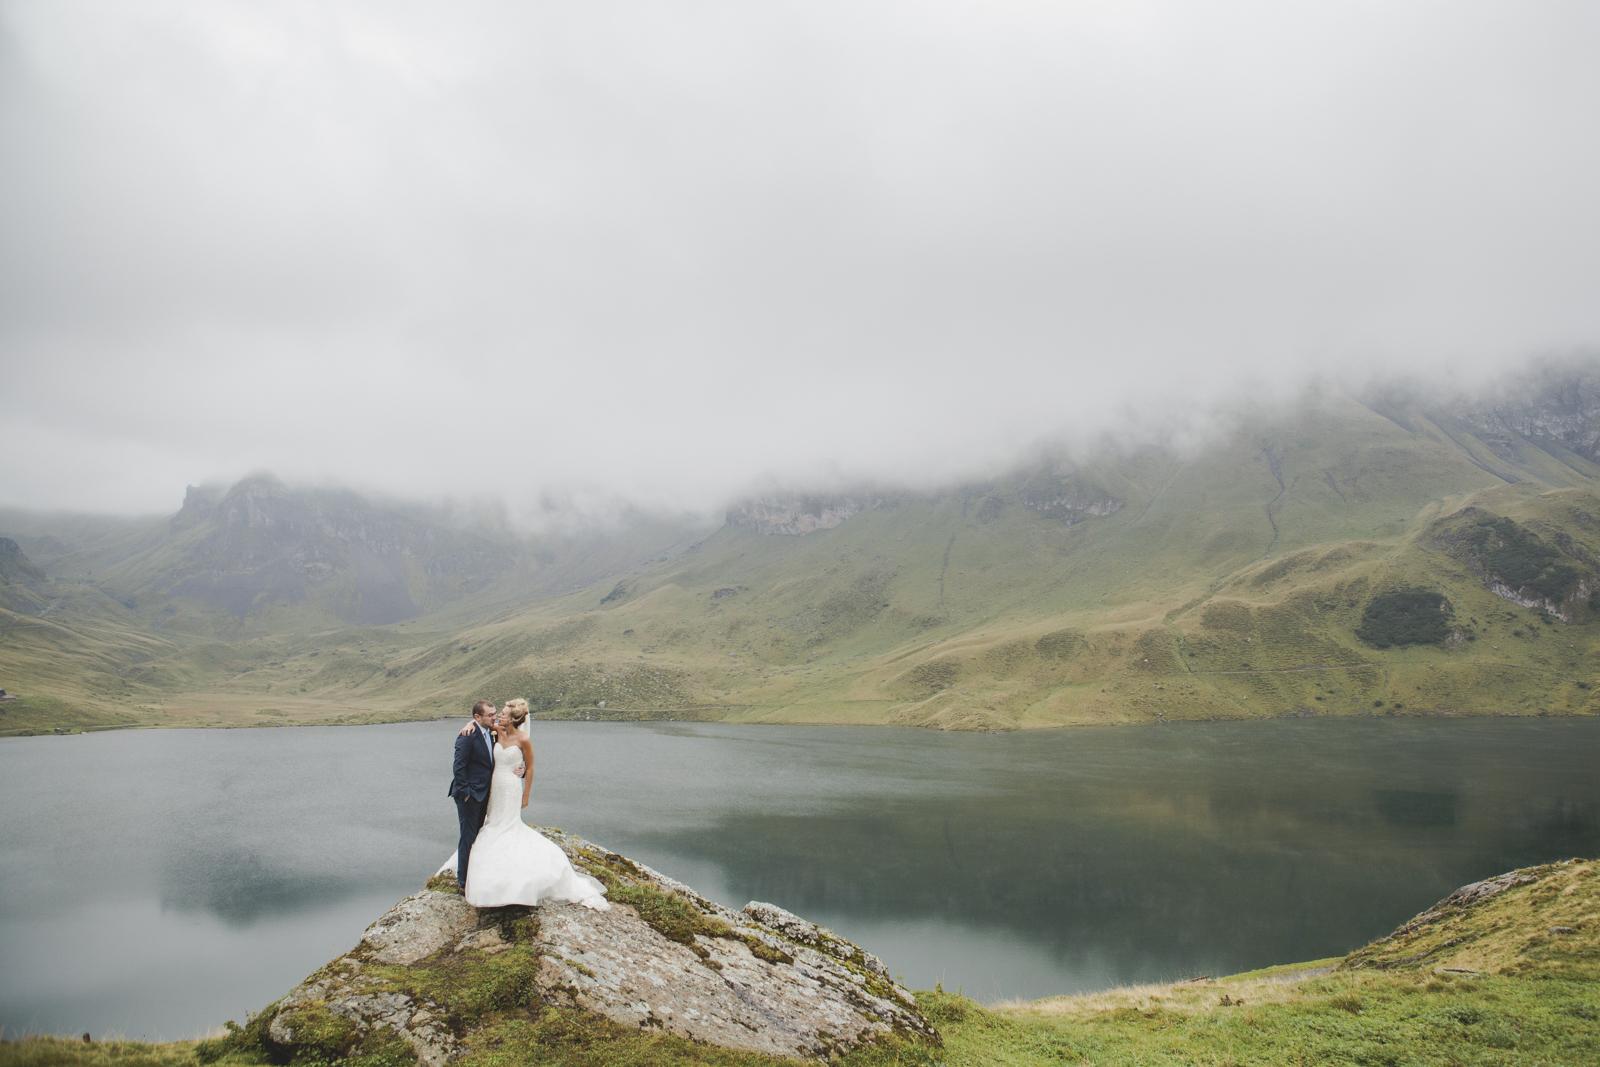 MARCO TORRE DESTINATION WEDDING PHOTOGRAPHER SWITZERLAND PHOTOGRAPHER ALPS